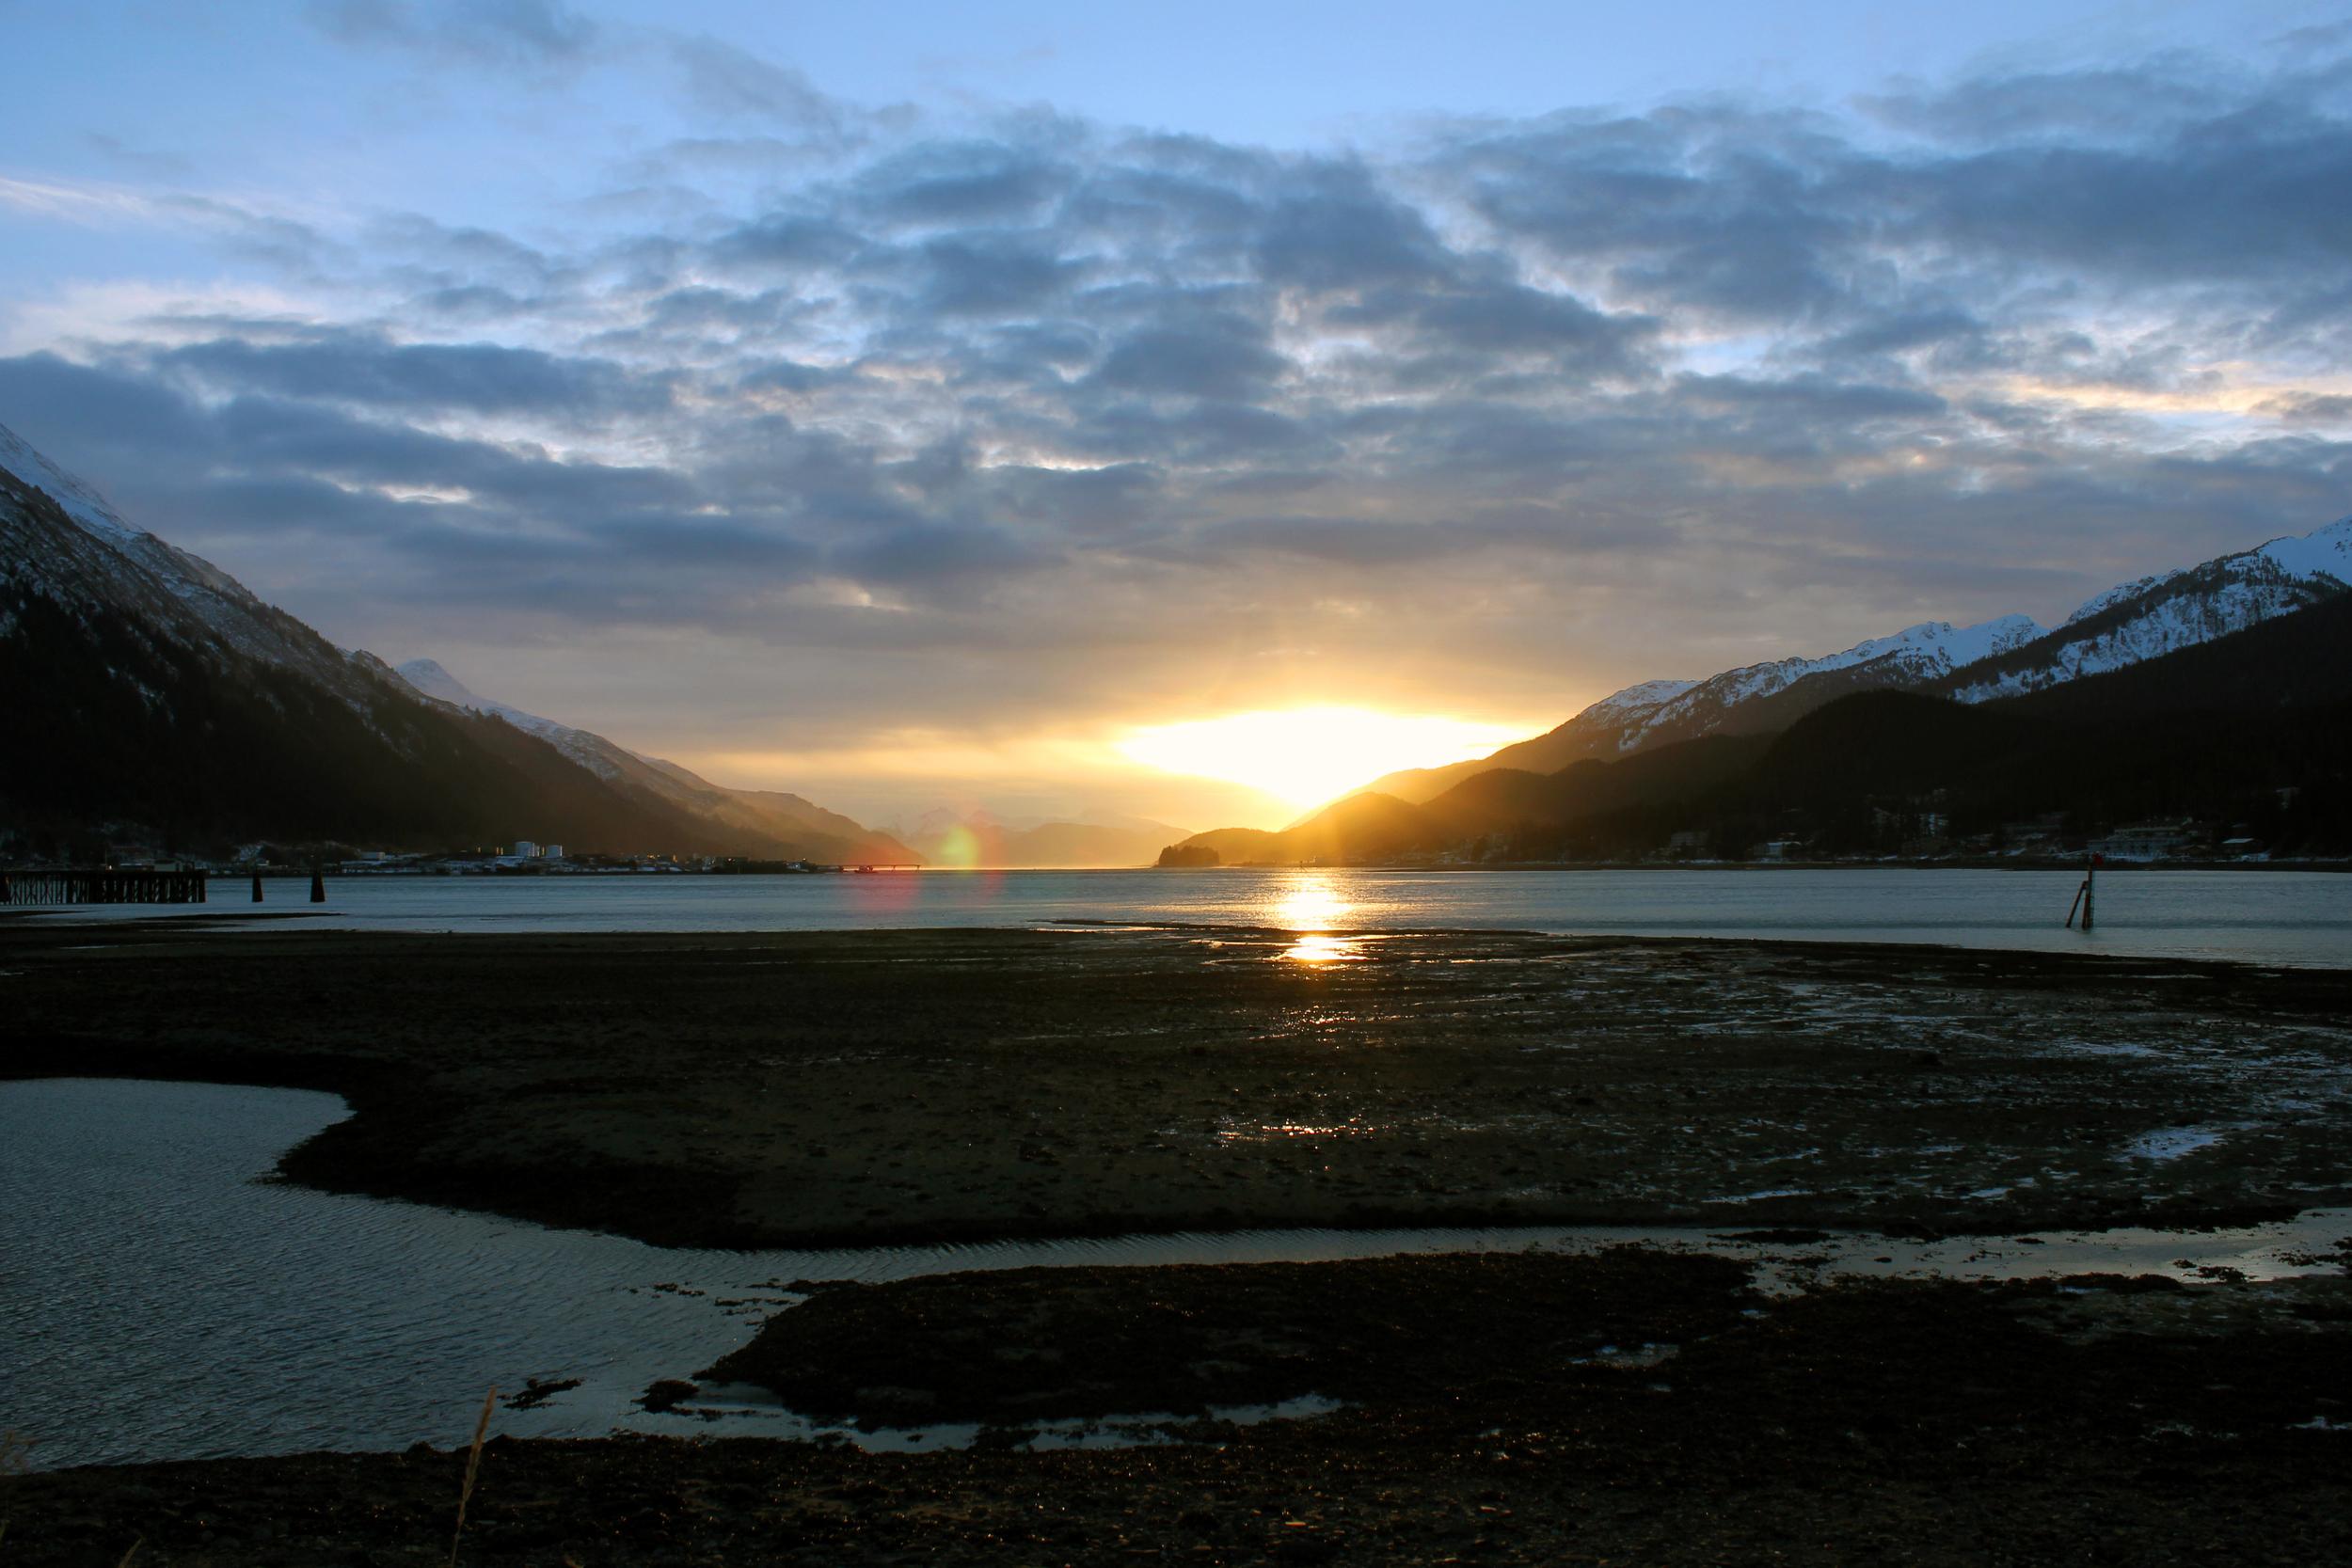 Sunrise over Gastineau Channel